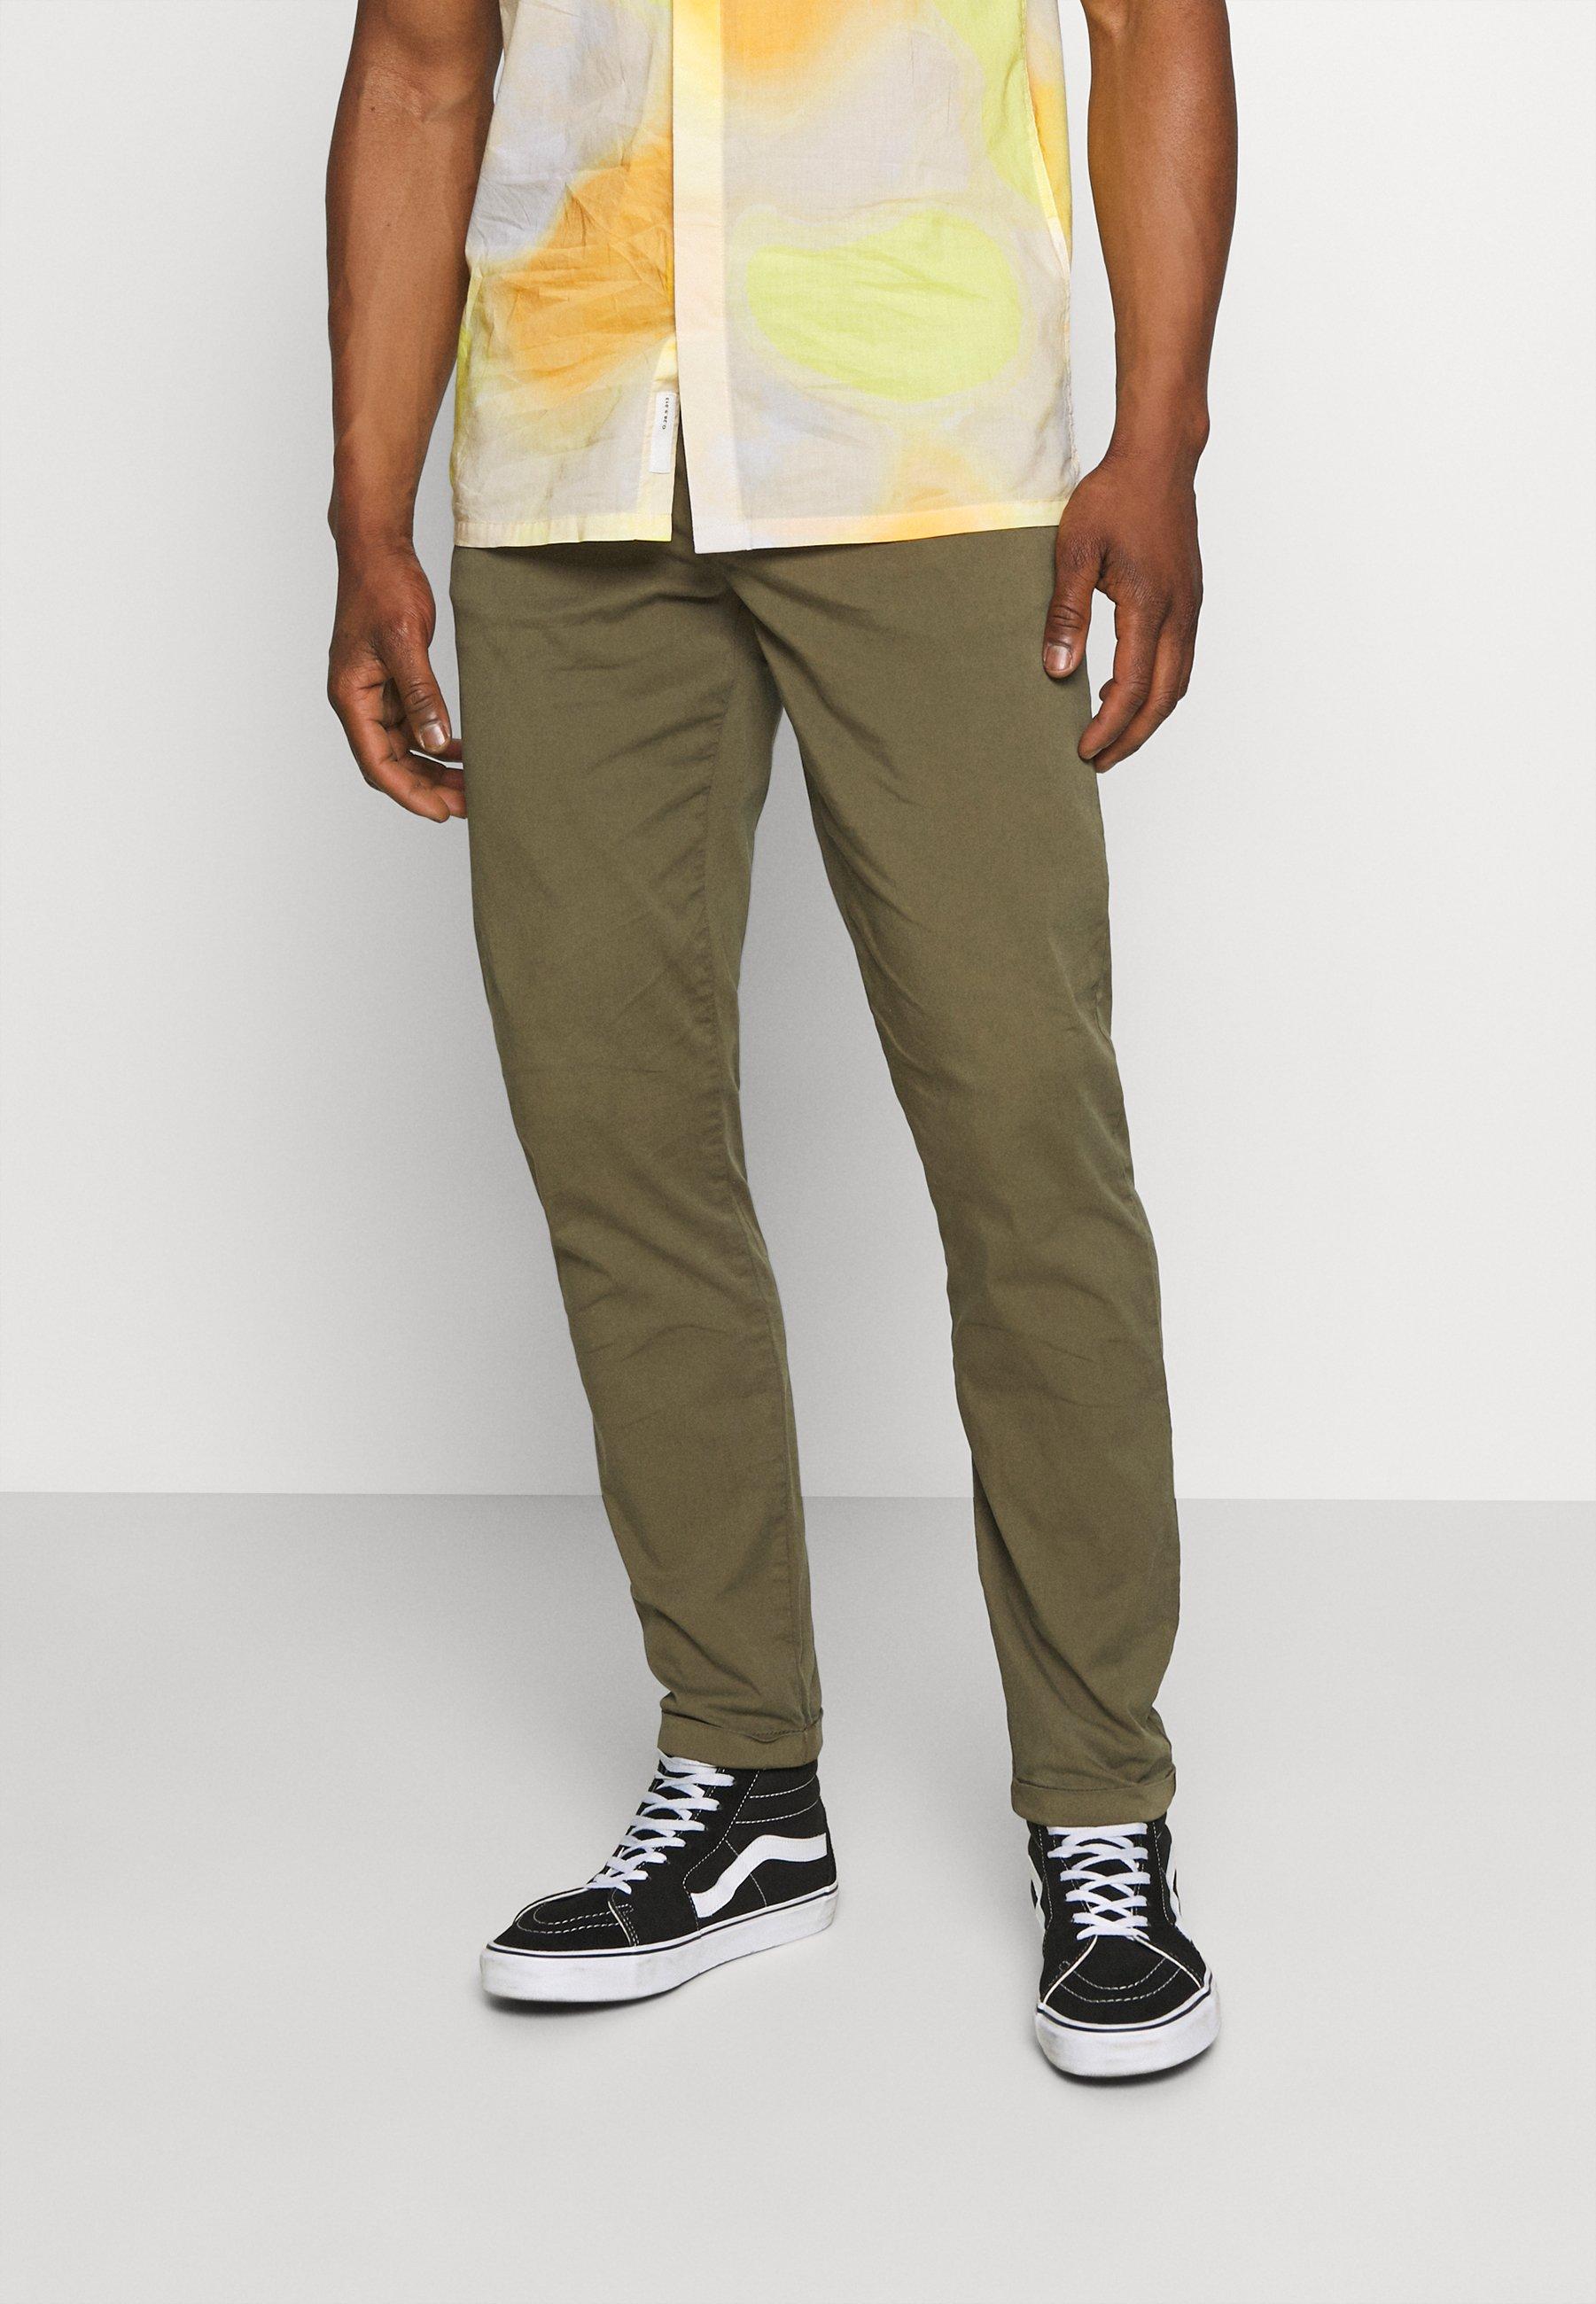 Uomo MICK PANTS - Pantaloni